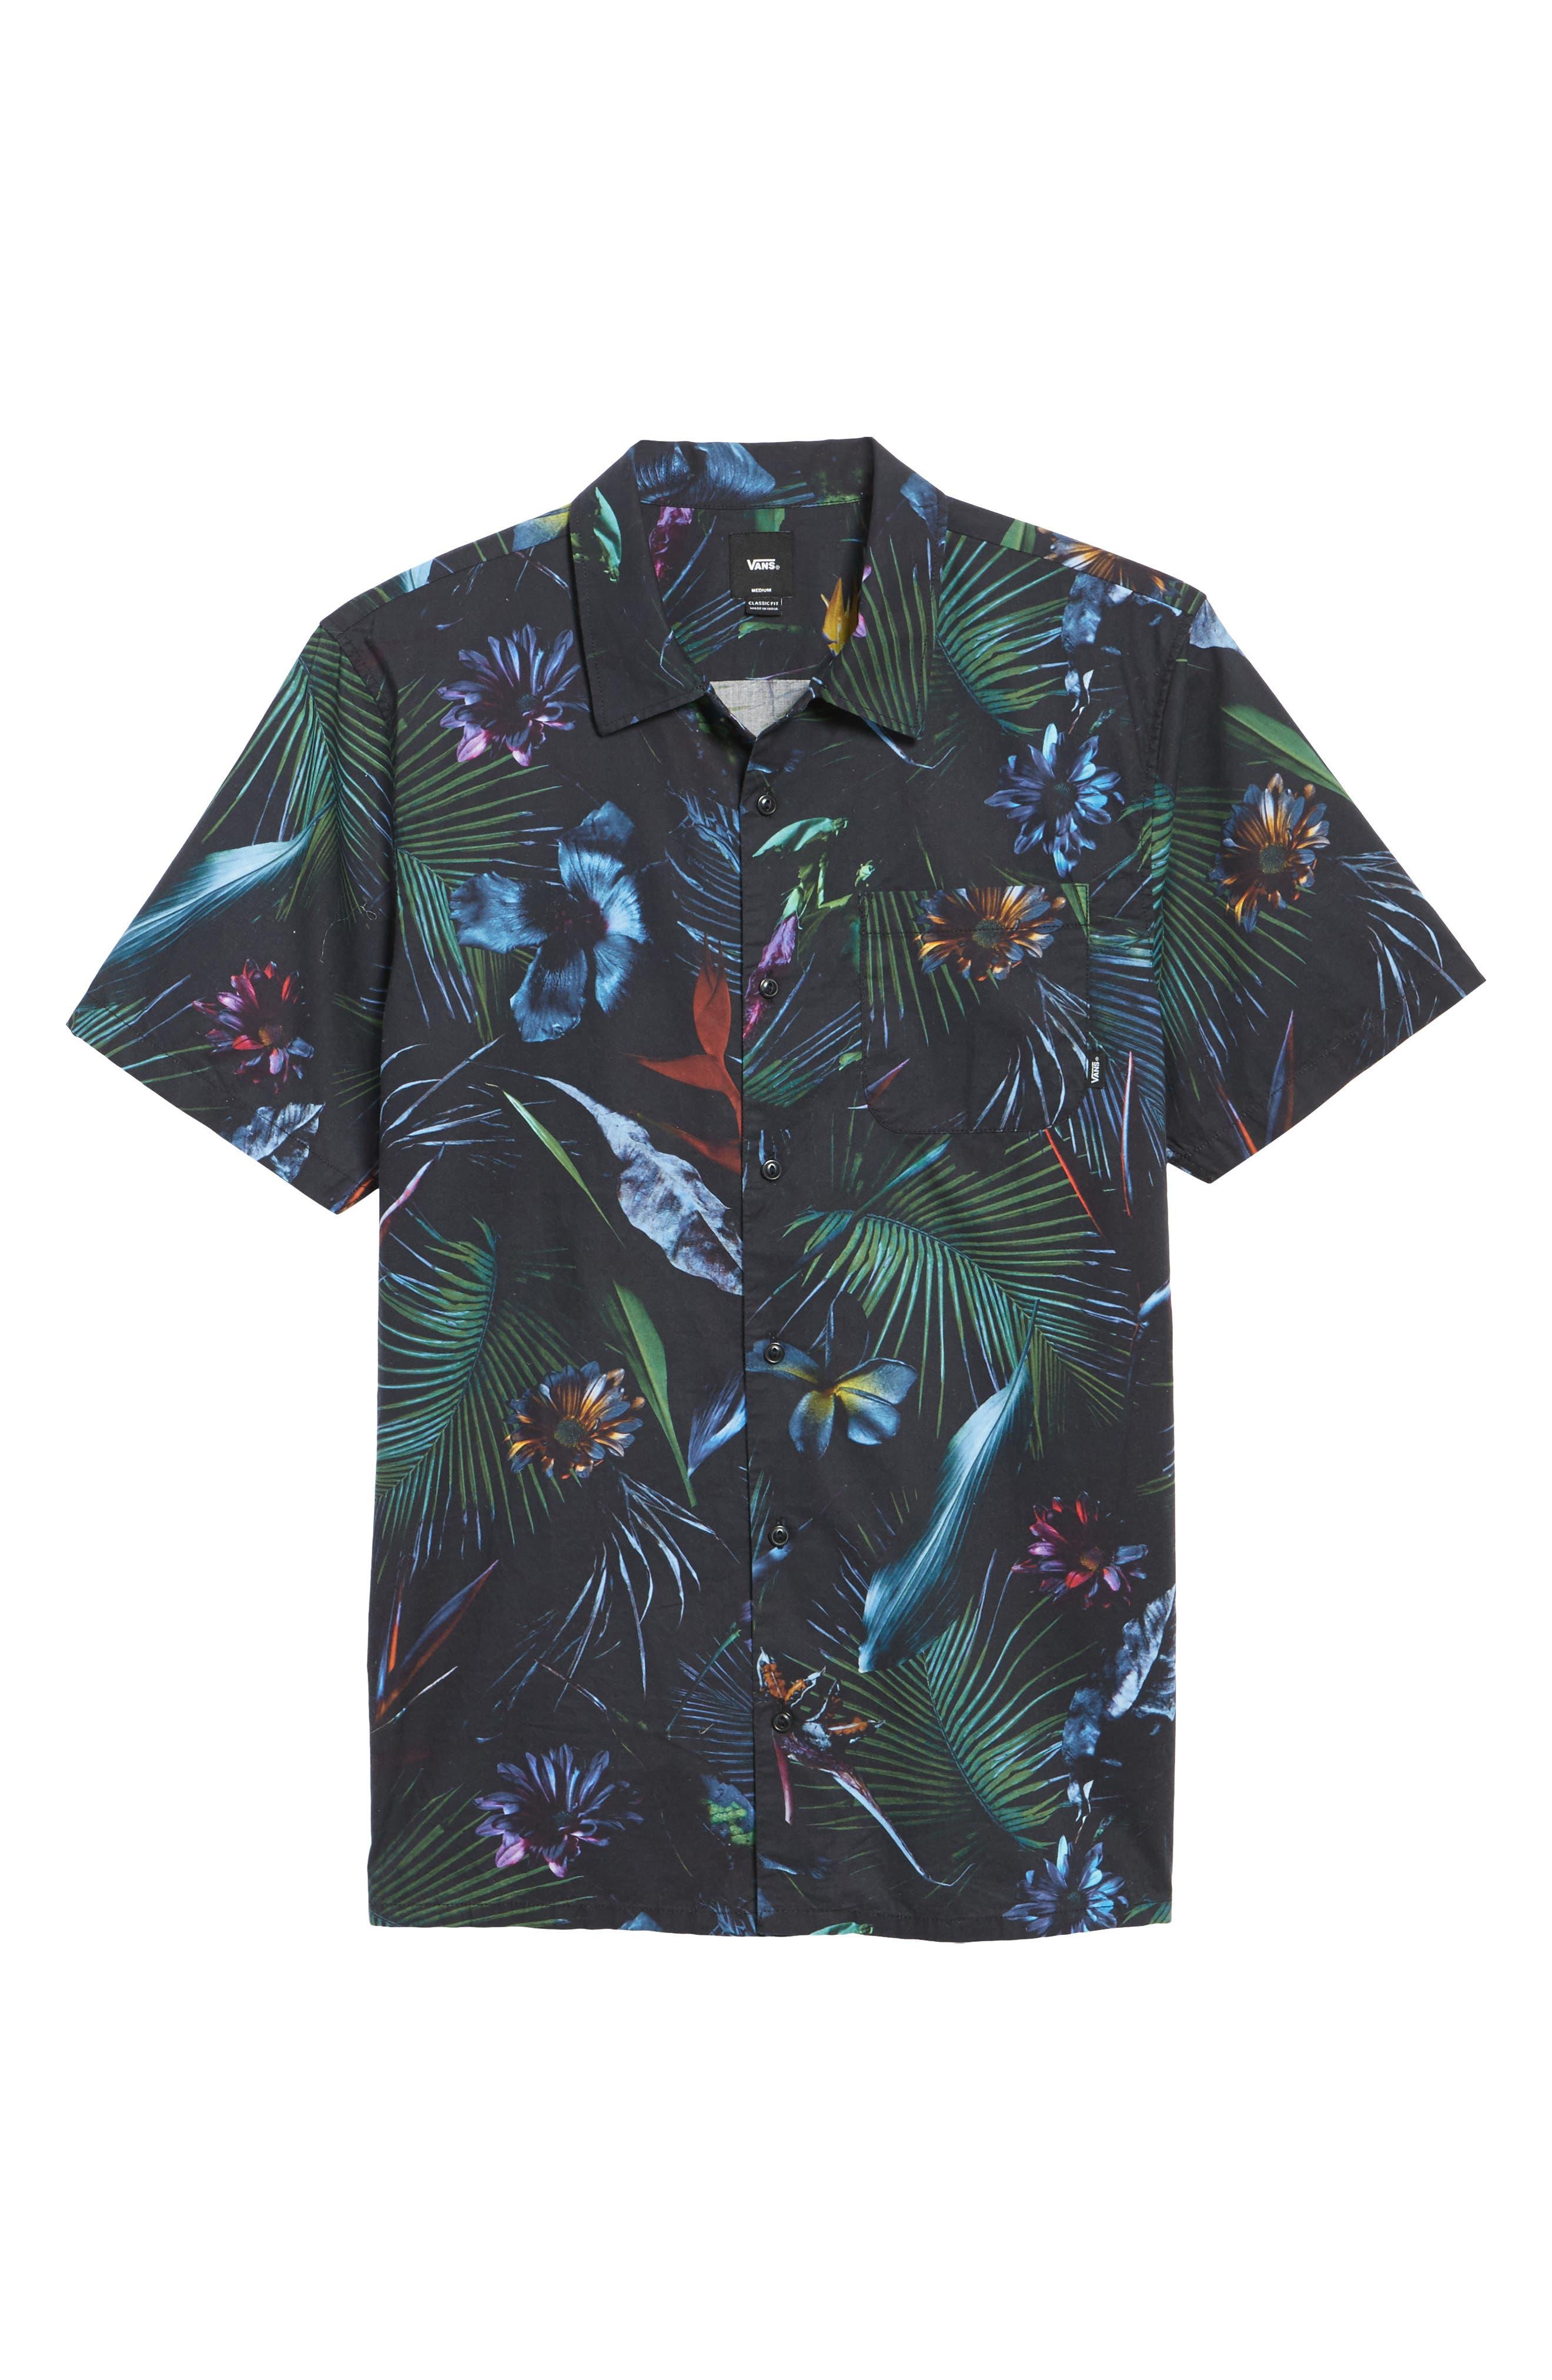 Neo Jungle Short Sleeve Shirt,                             Alternate thumbnail 6, color,                             001